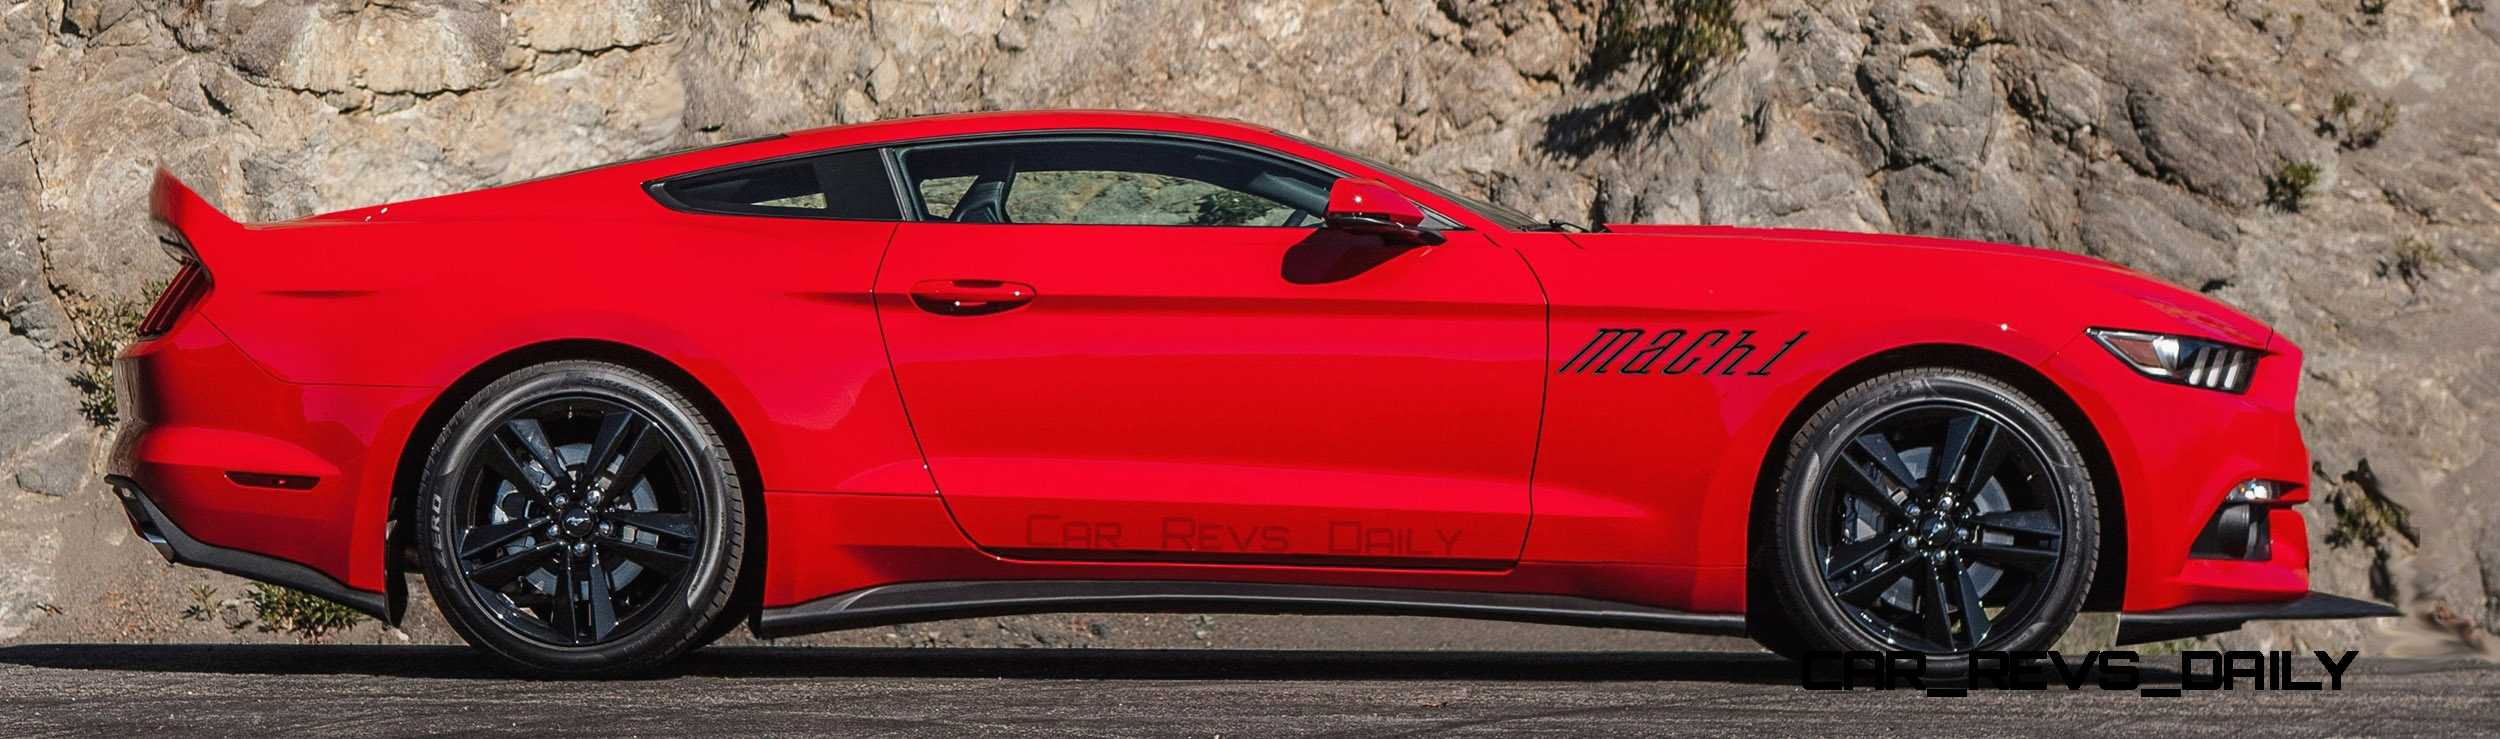 Future Car Renderings 2017 Ford Mustang Mach 1 5